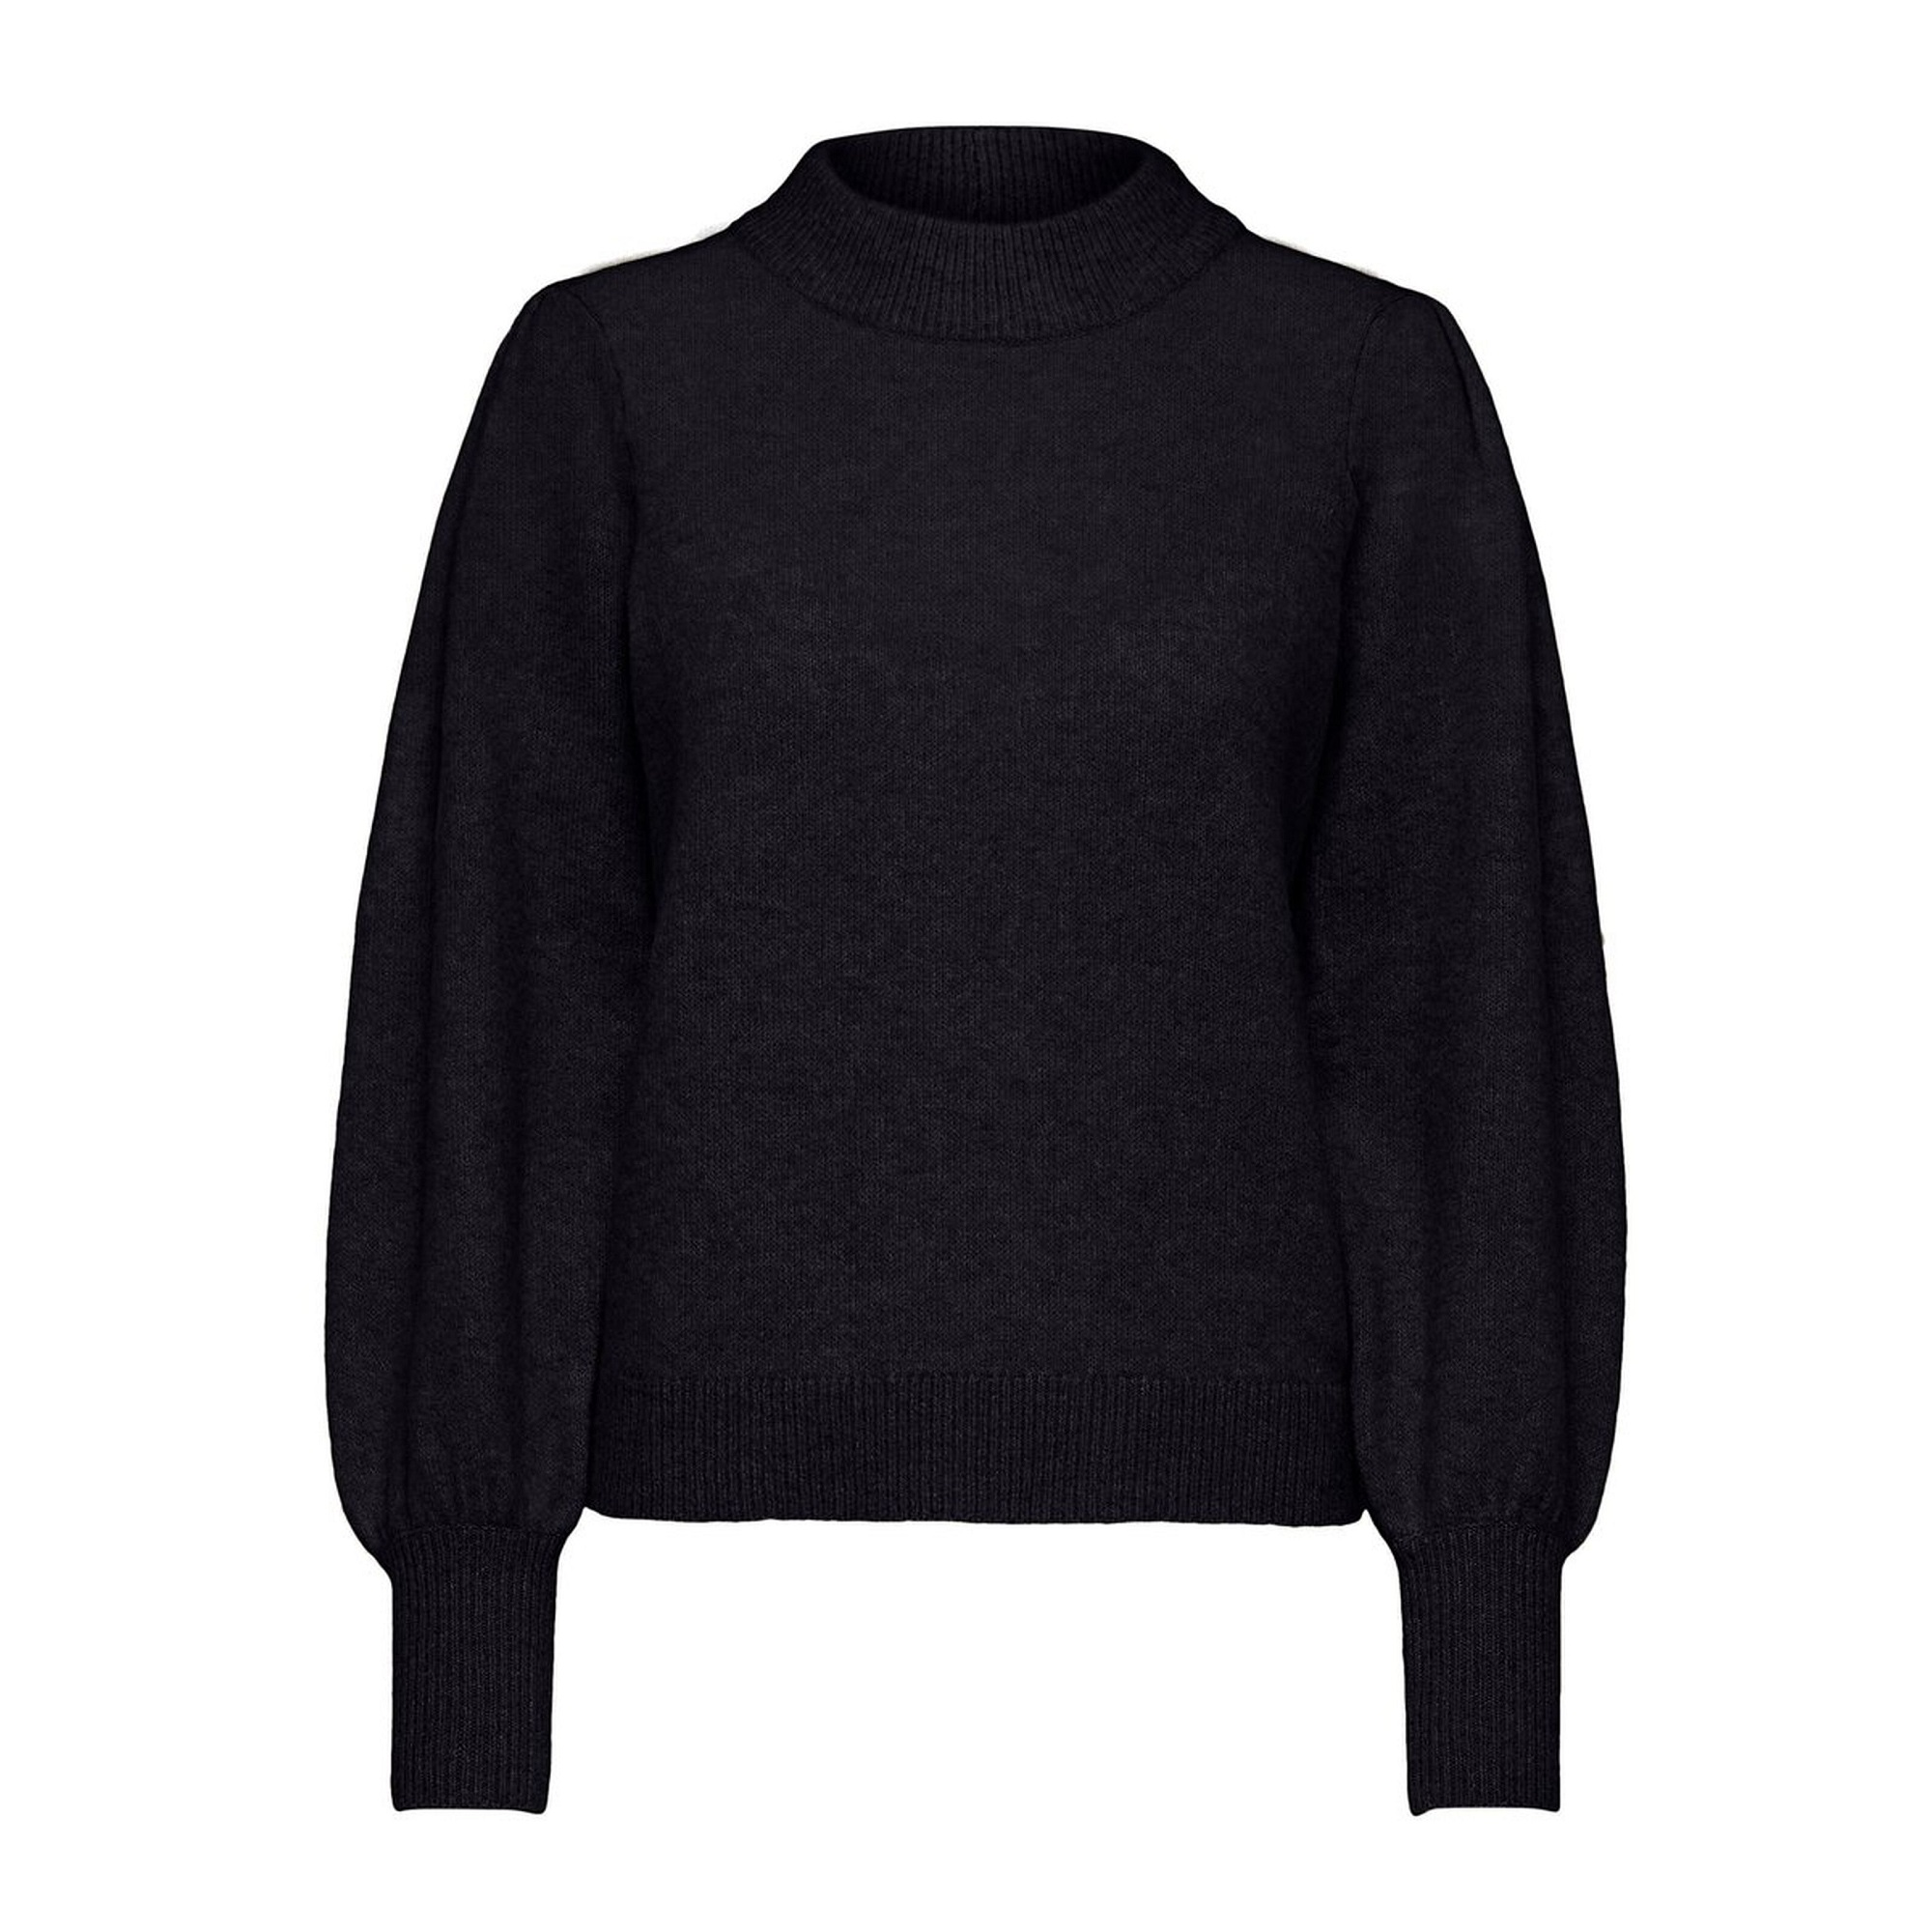 Block Knit Black